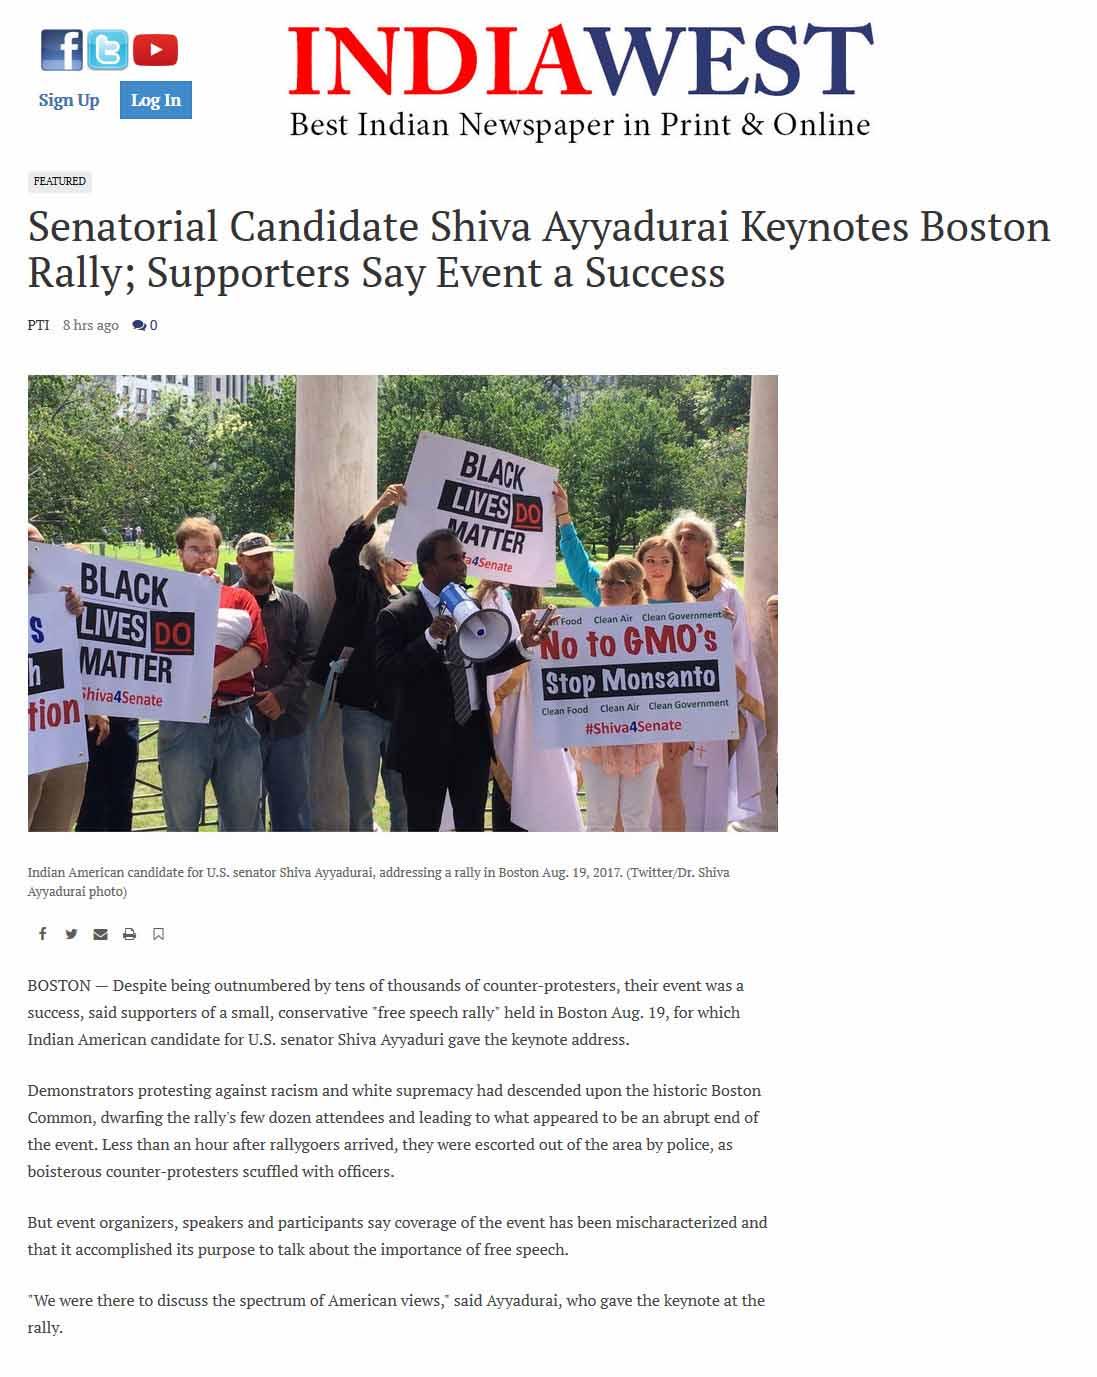 Senatorial Candidate Shiva Ayyadurai Keynotes Boston Rally